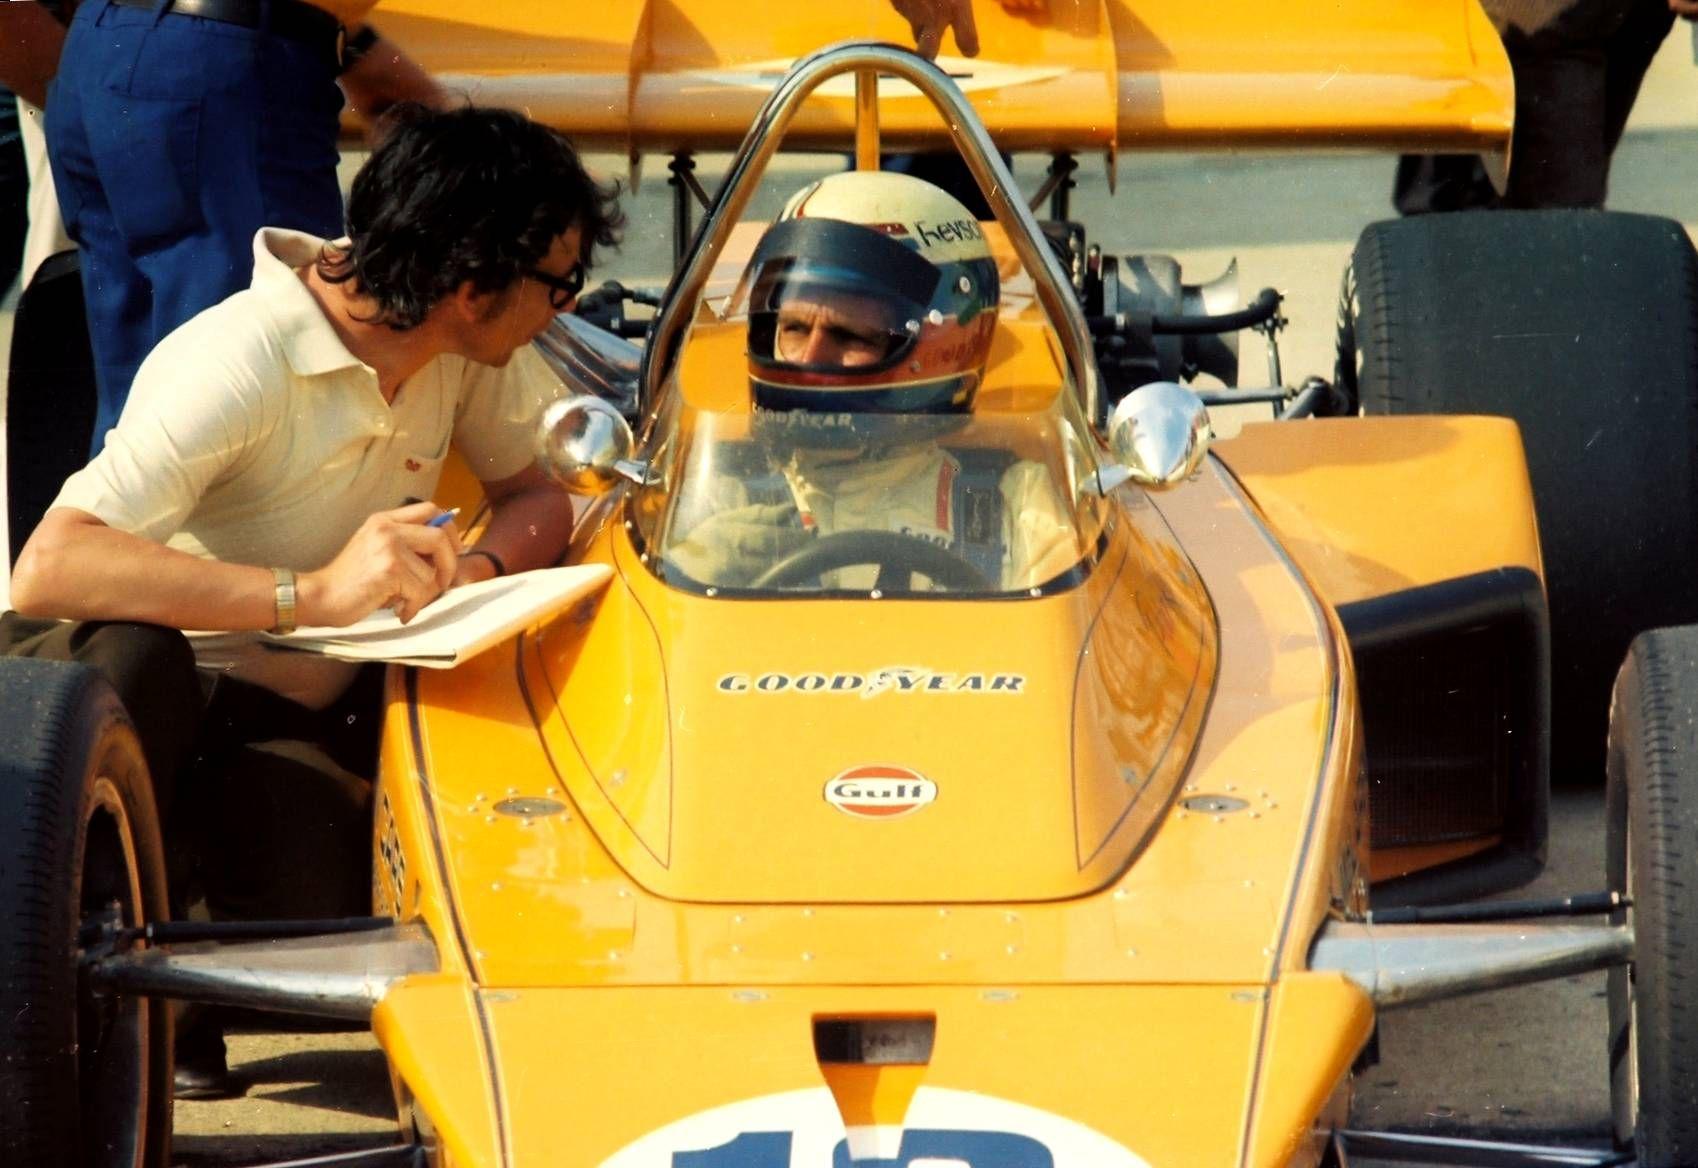 Peter Revson McLaren M16B [2] Offenhauser 159 ci turbo